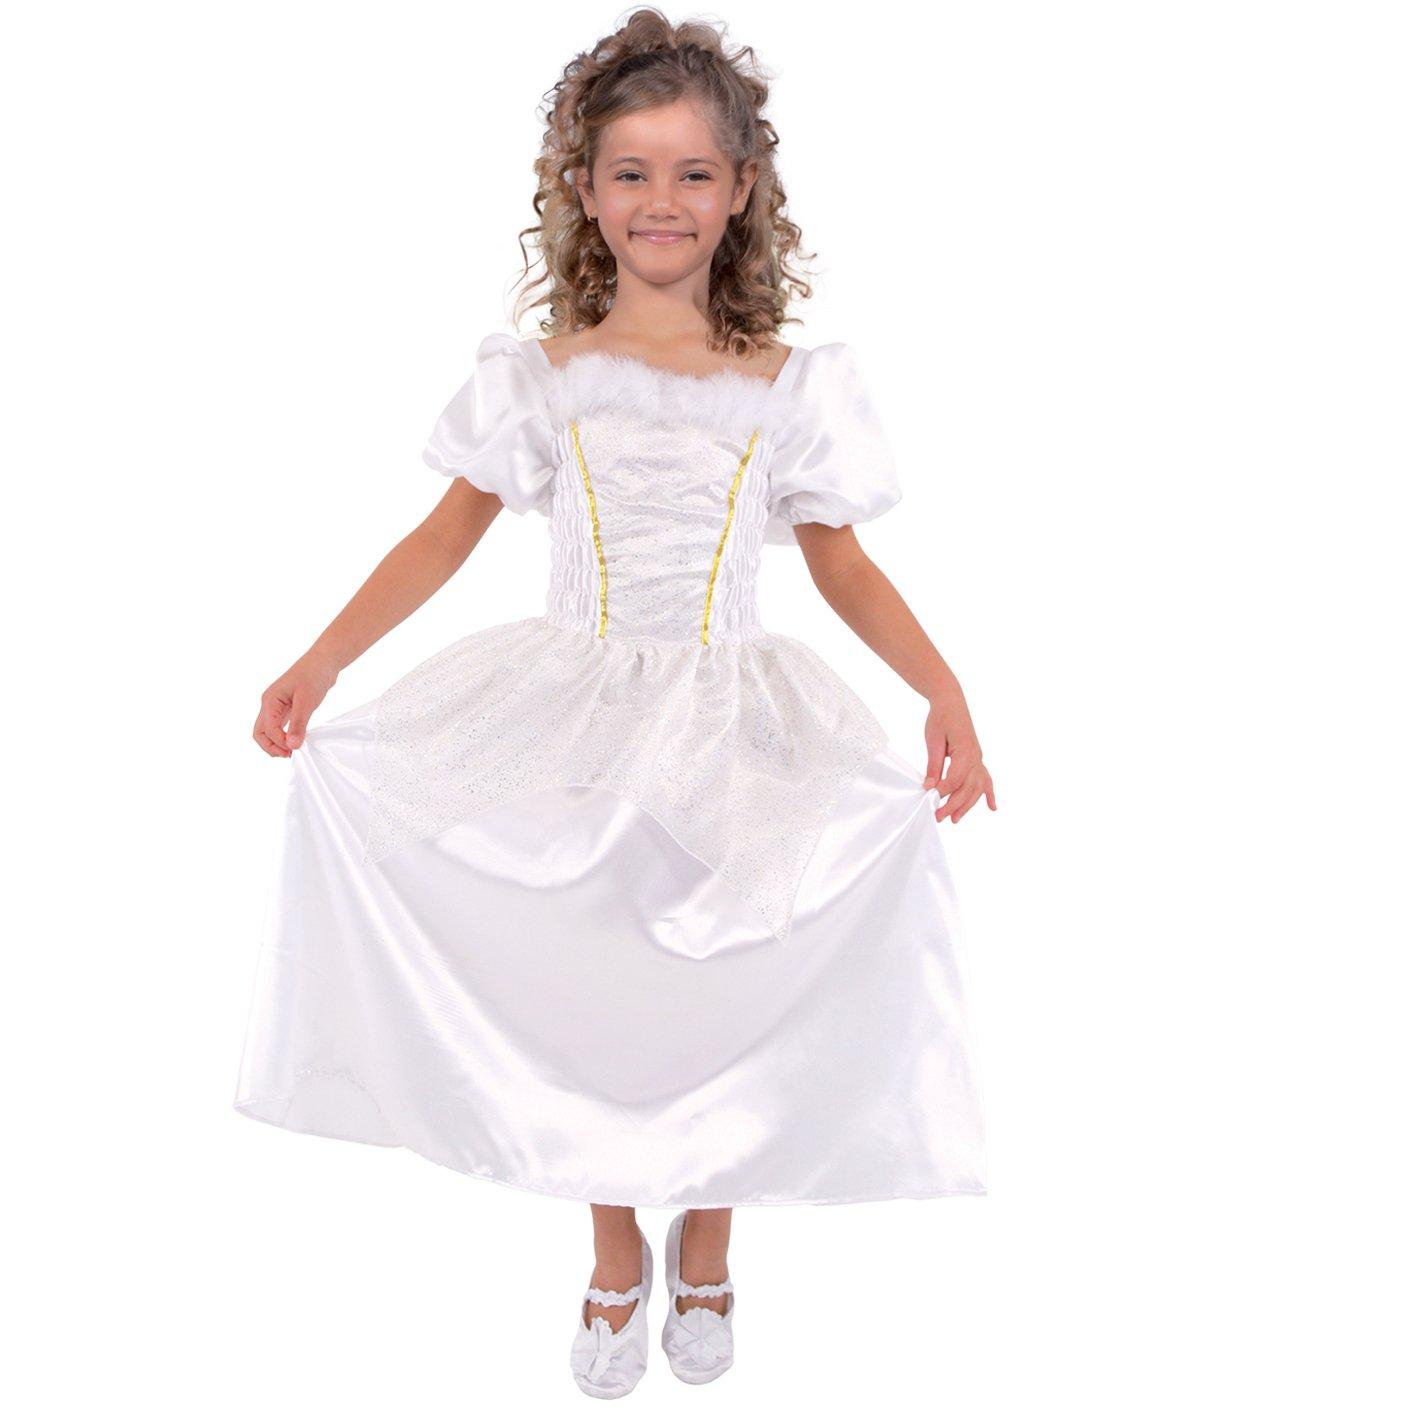 Cesar C692-006 - Costume da principessa, taglia 116 cm, colore  Bianco